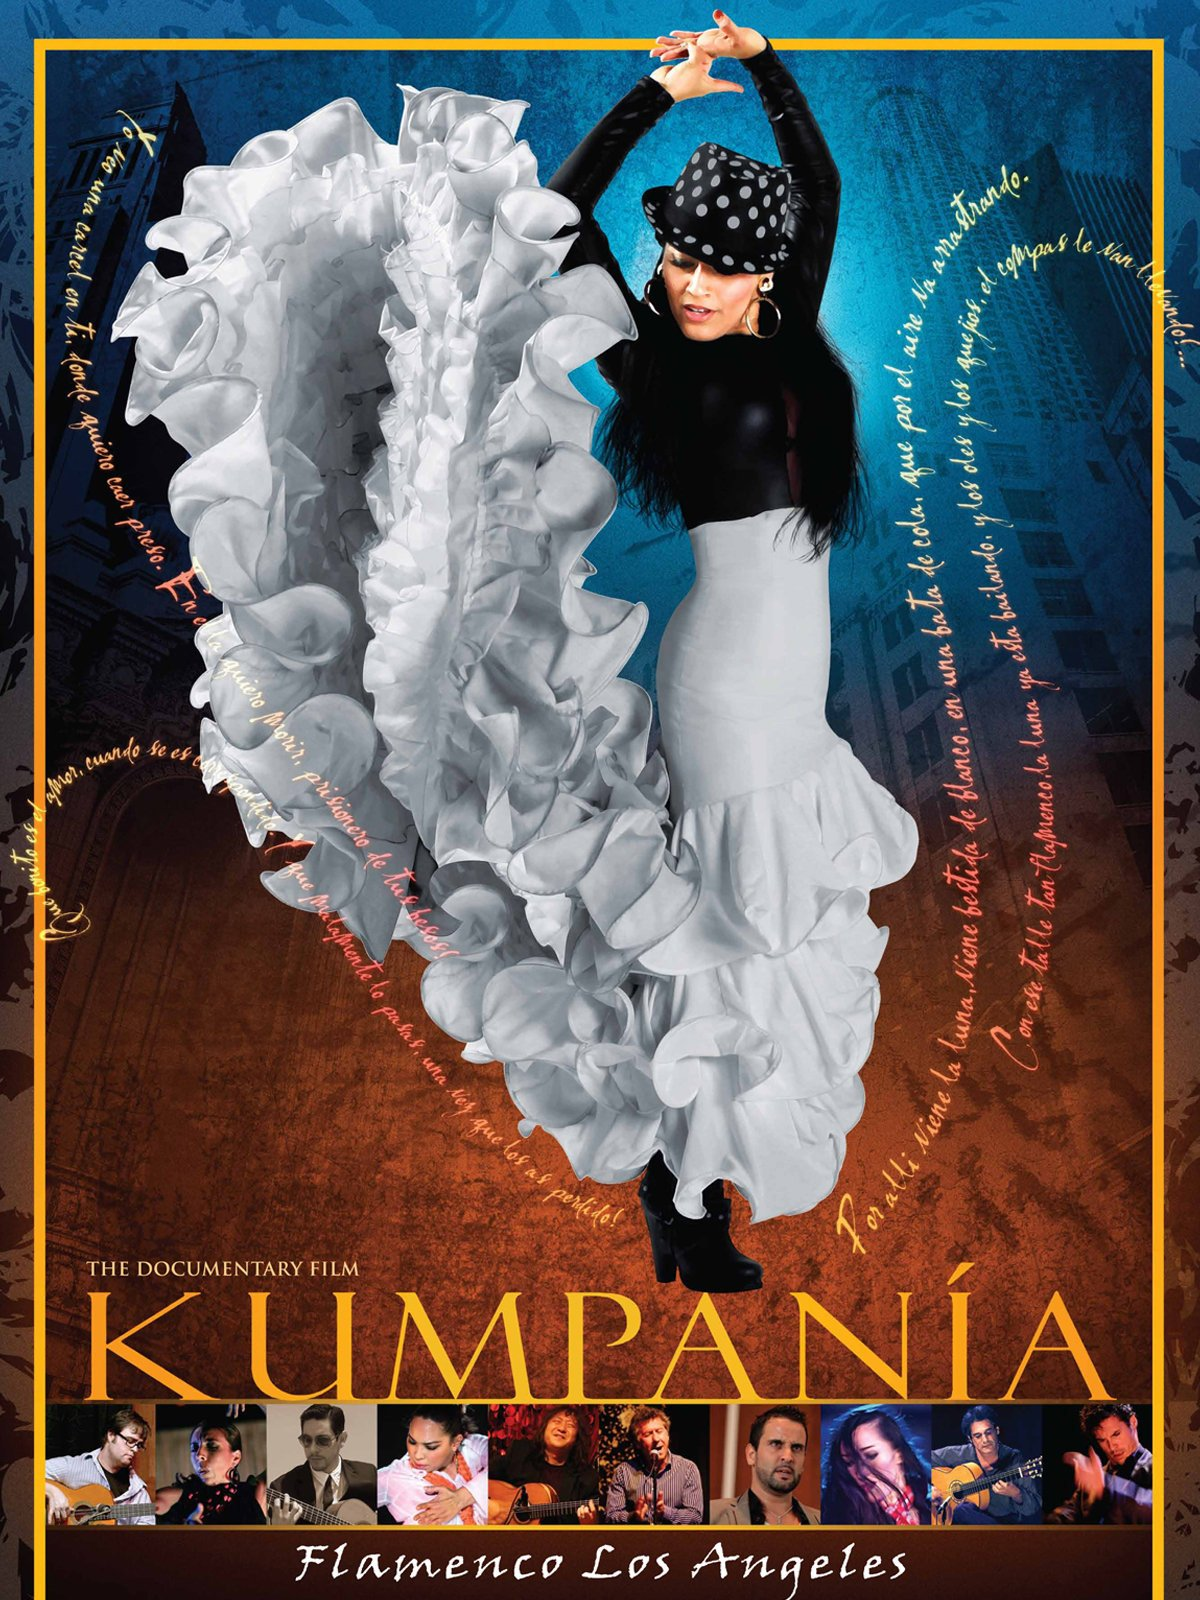 Kumpania - Flamenco Los Angeles on Amazon Prime Video UK